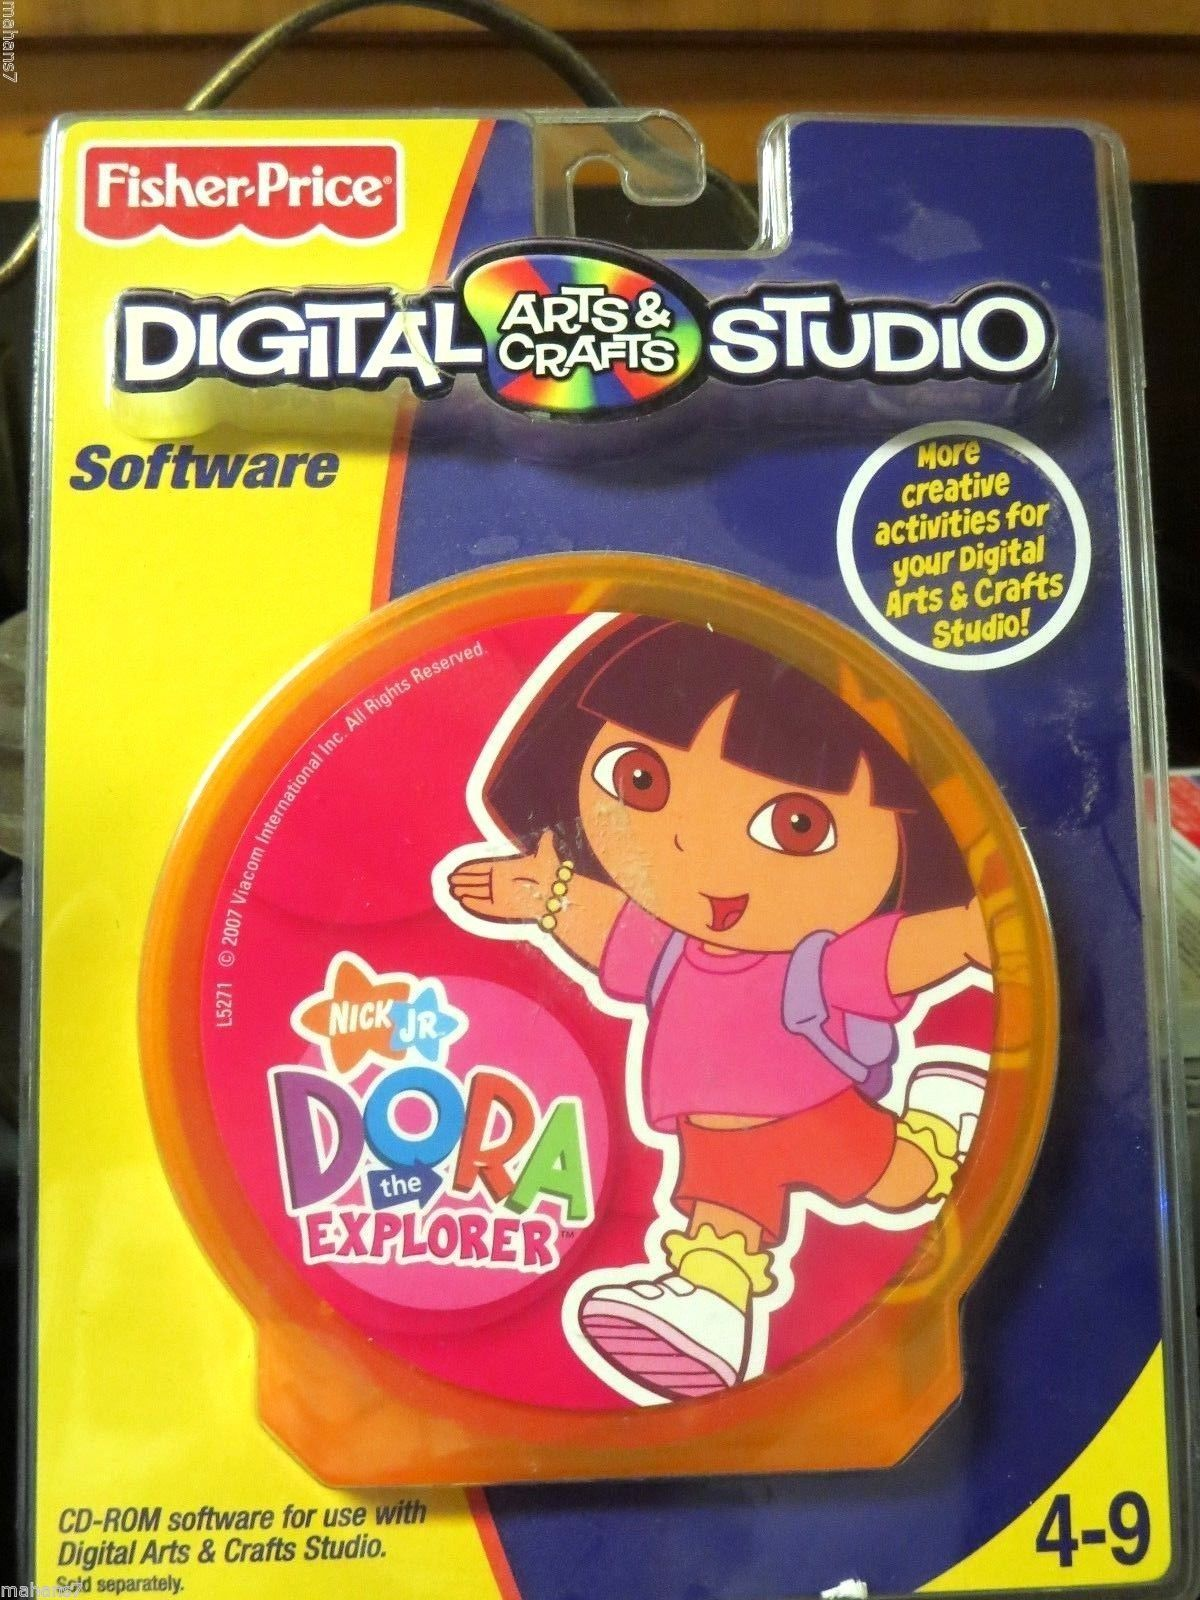 fisher price digital arts and crafts studio software nick